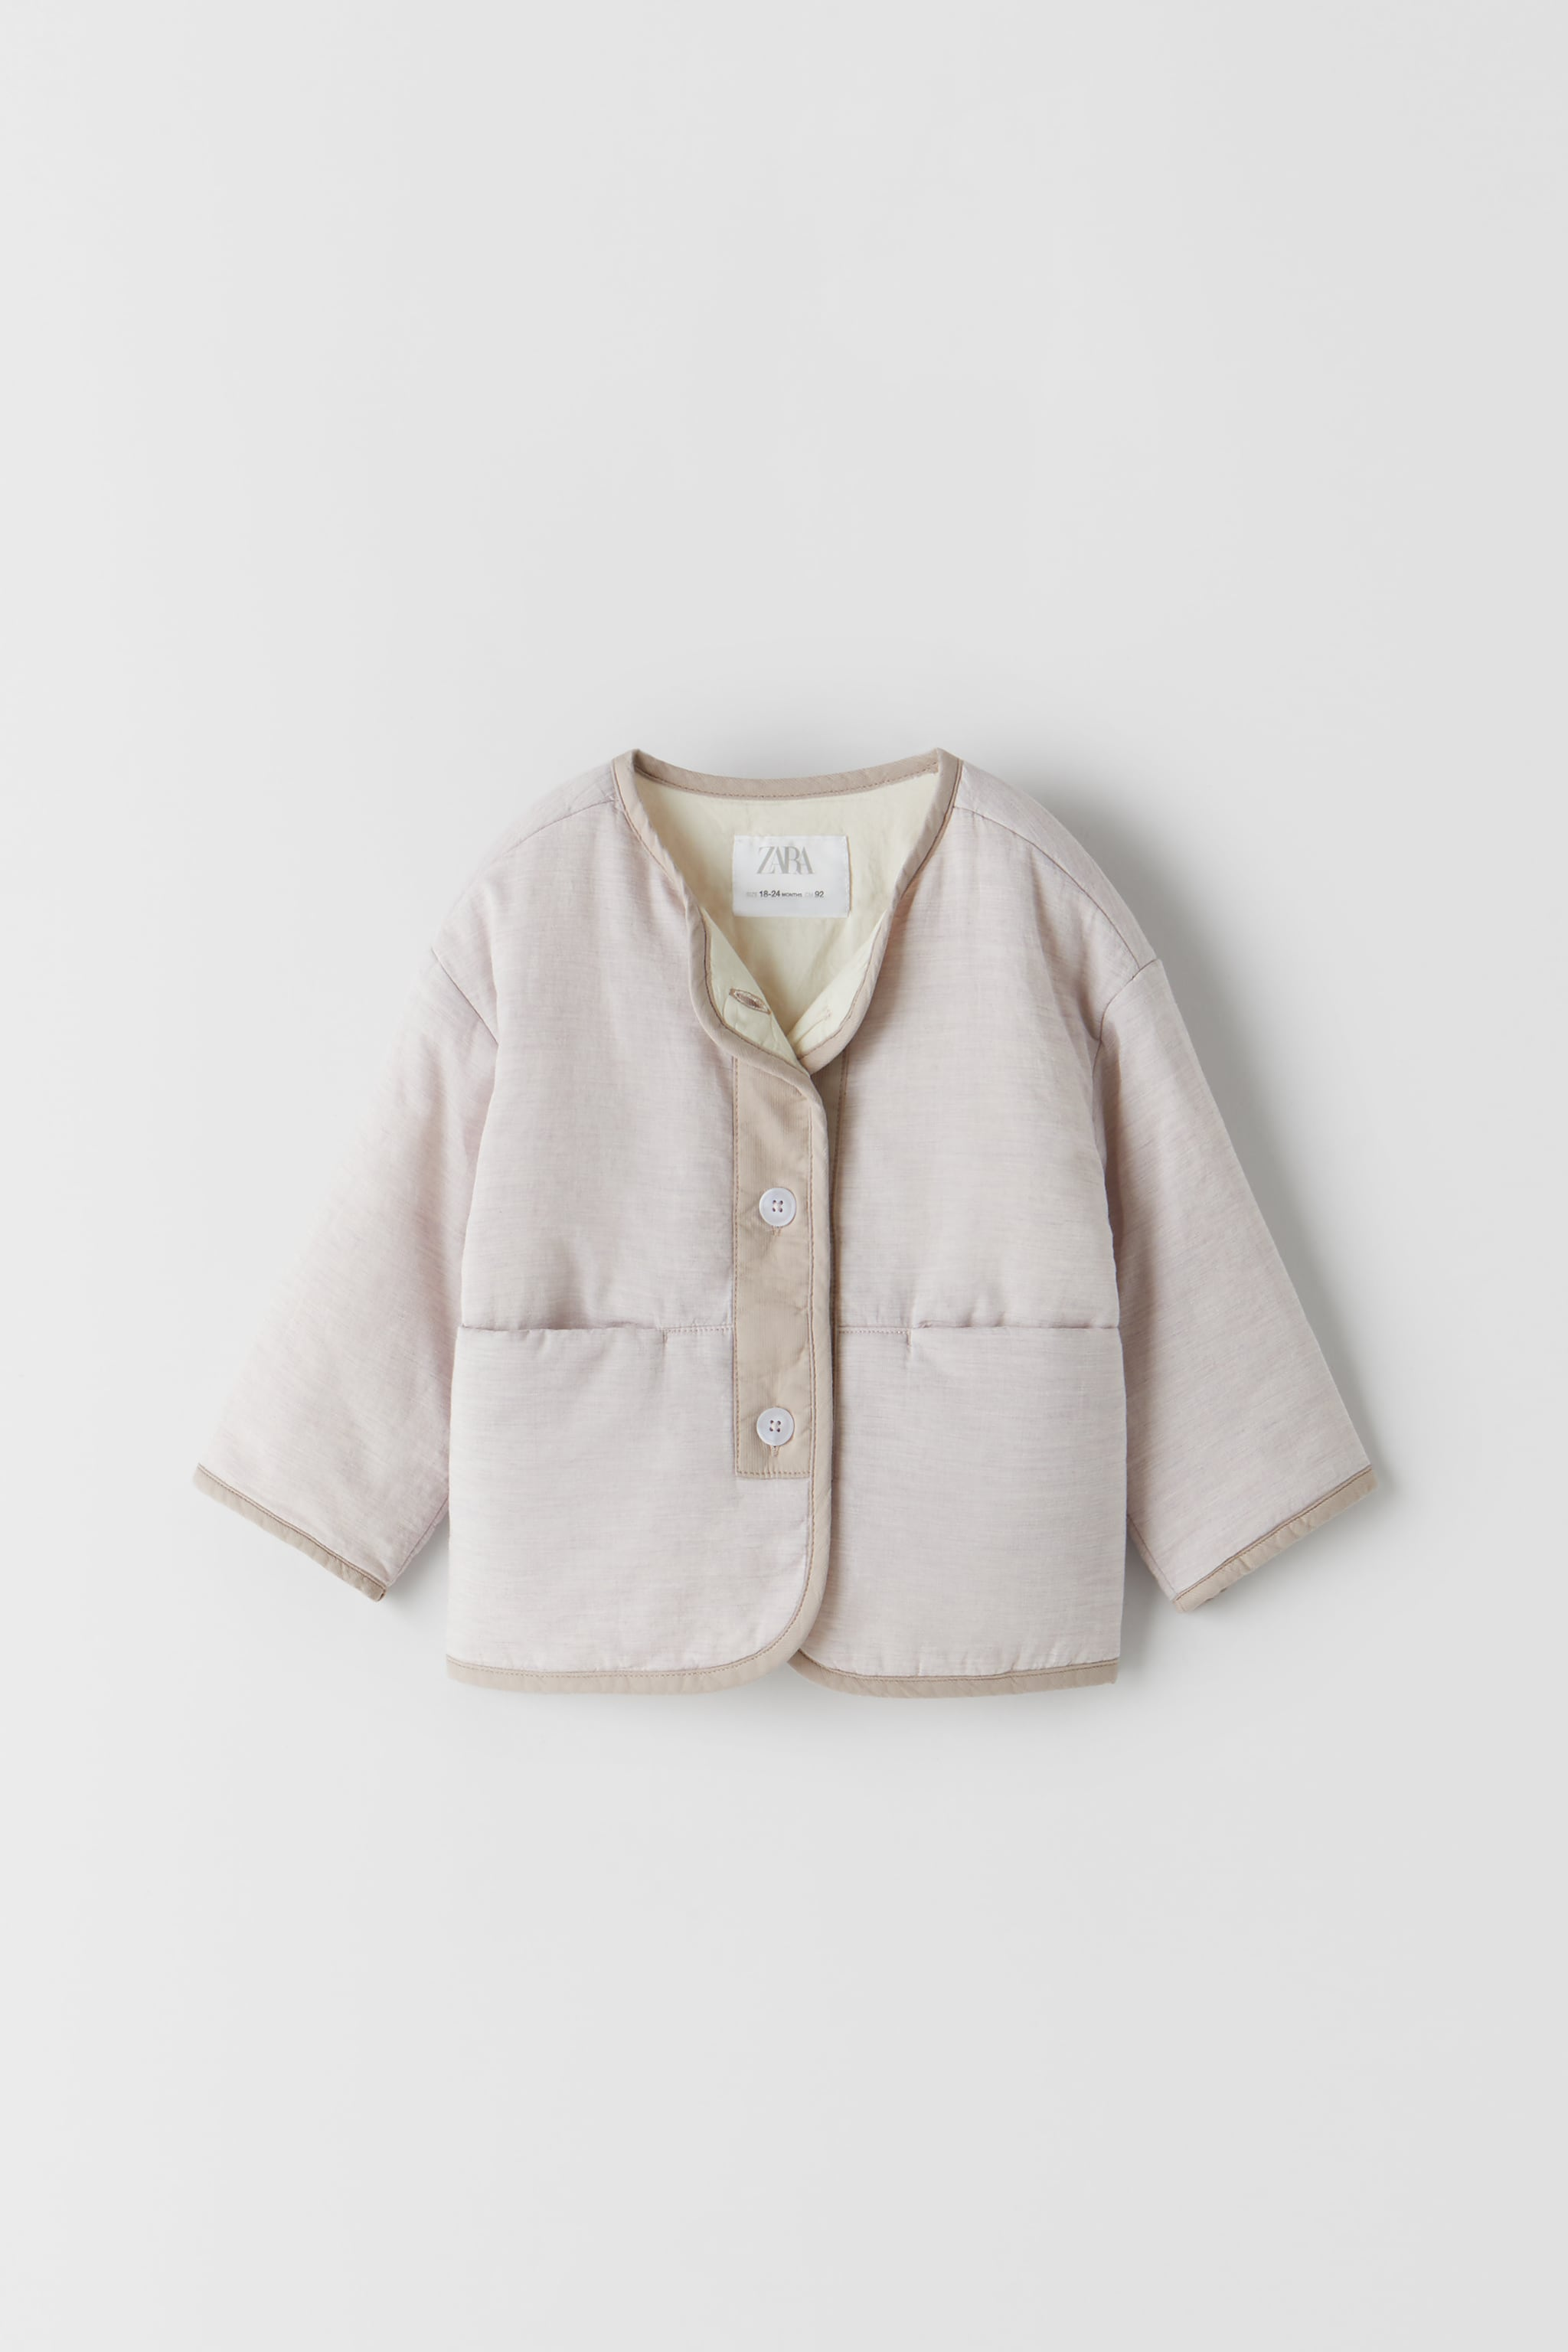 Zara COMBINATION QUILTED JACKET